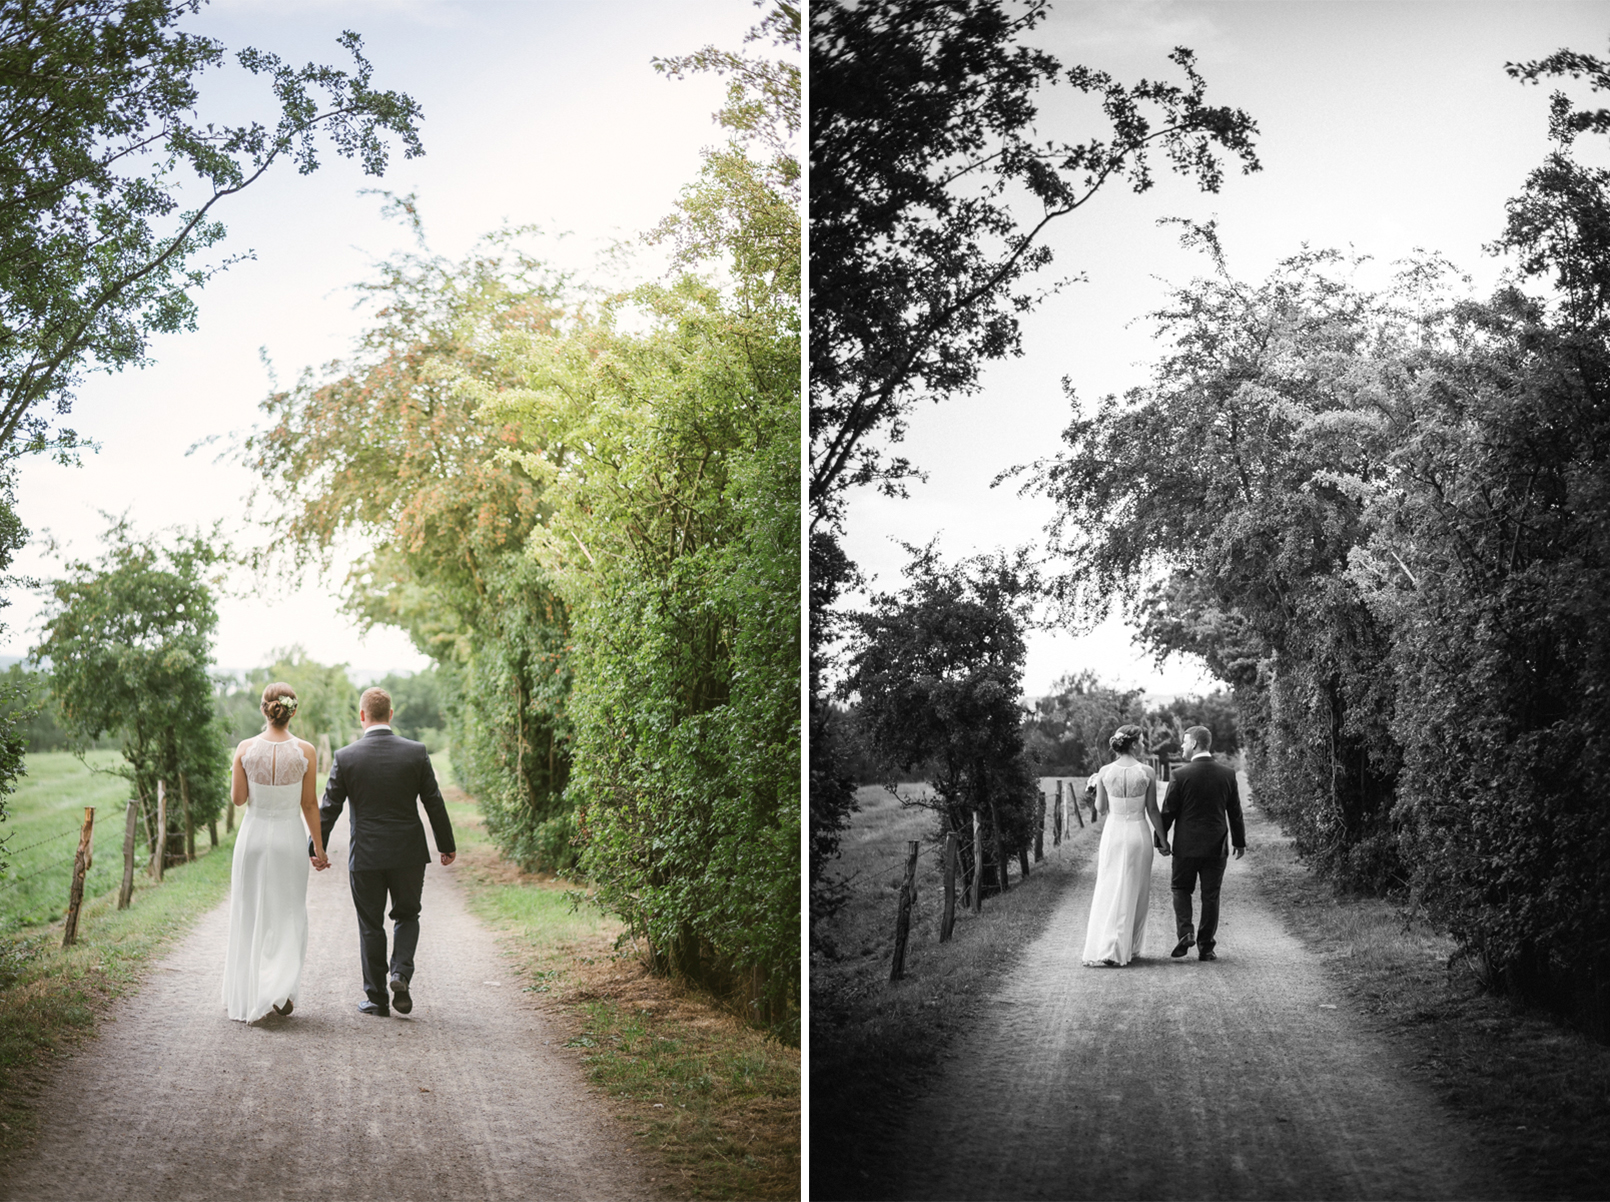 Hochzeitsfotograf-Fotografie-Aachen-Lua-Pauline-Dreamcatcher-0048